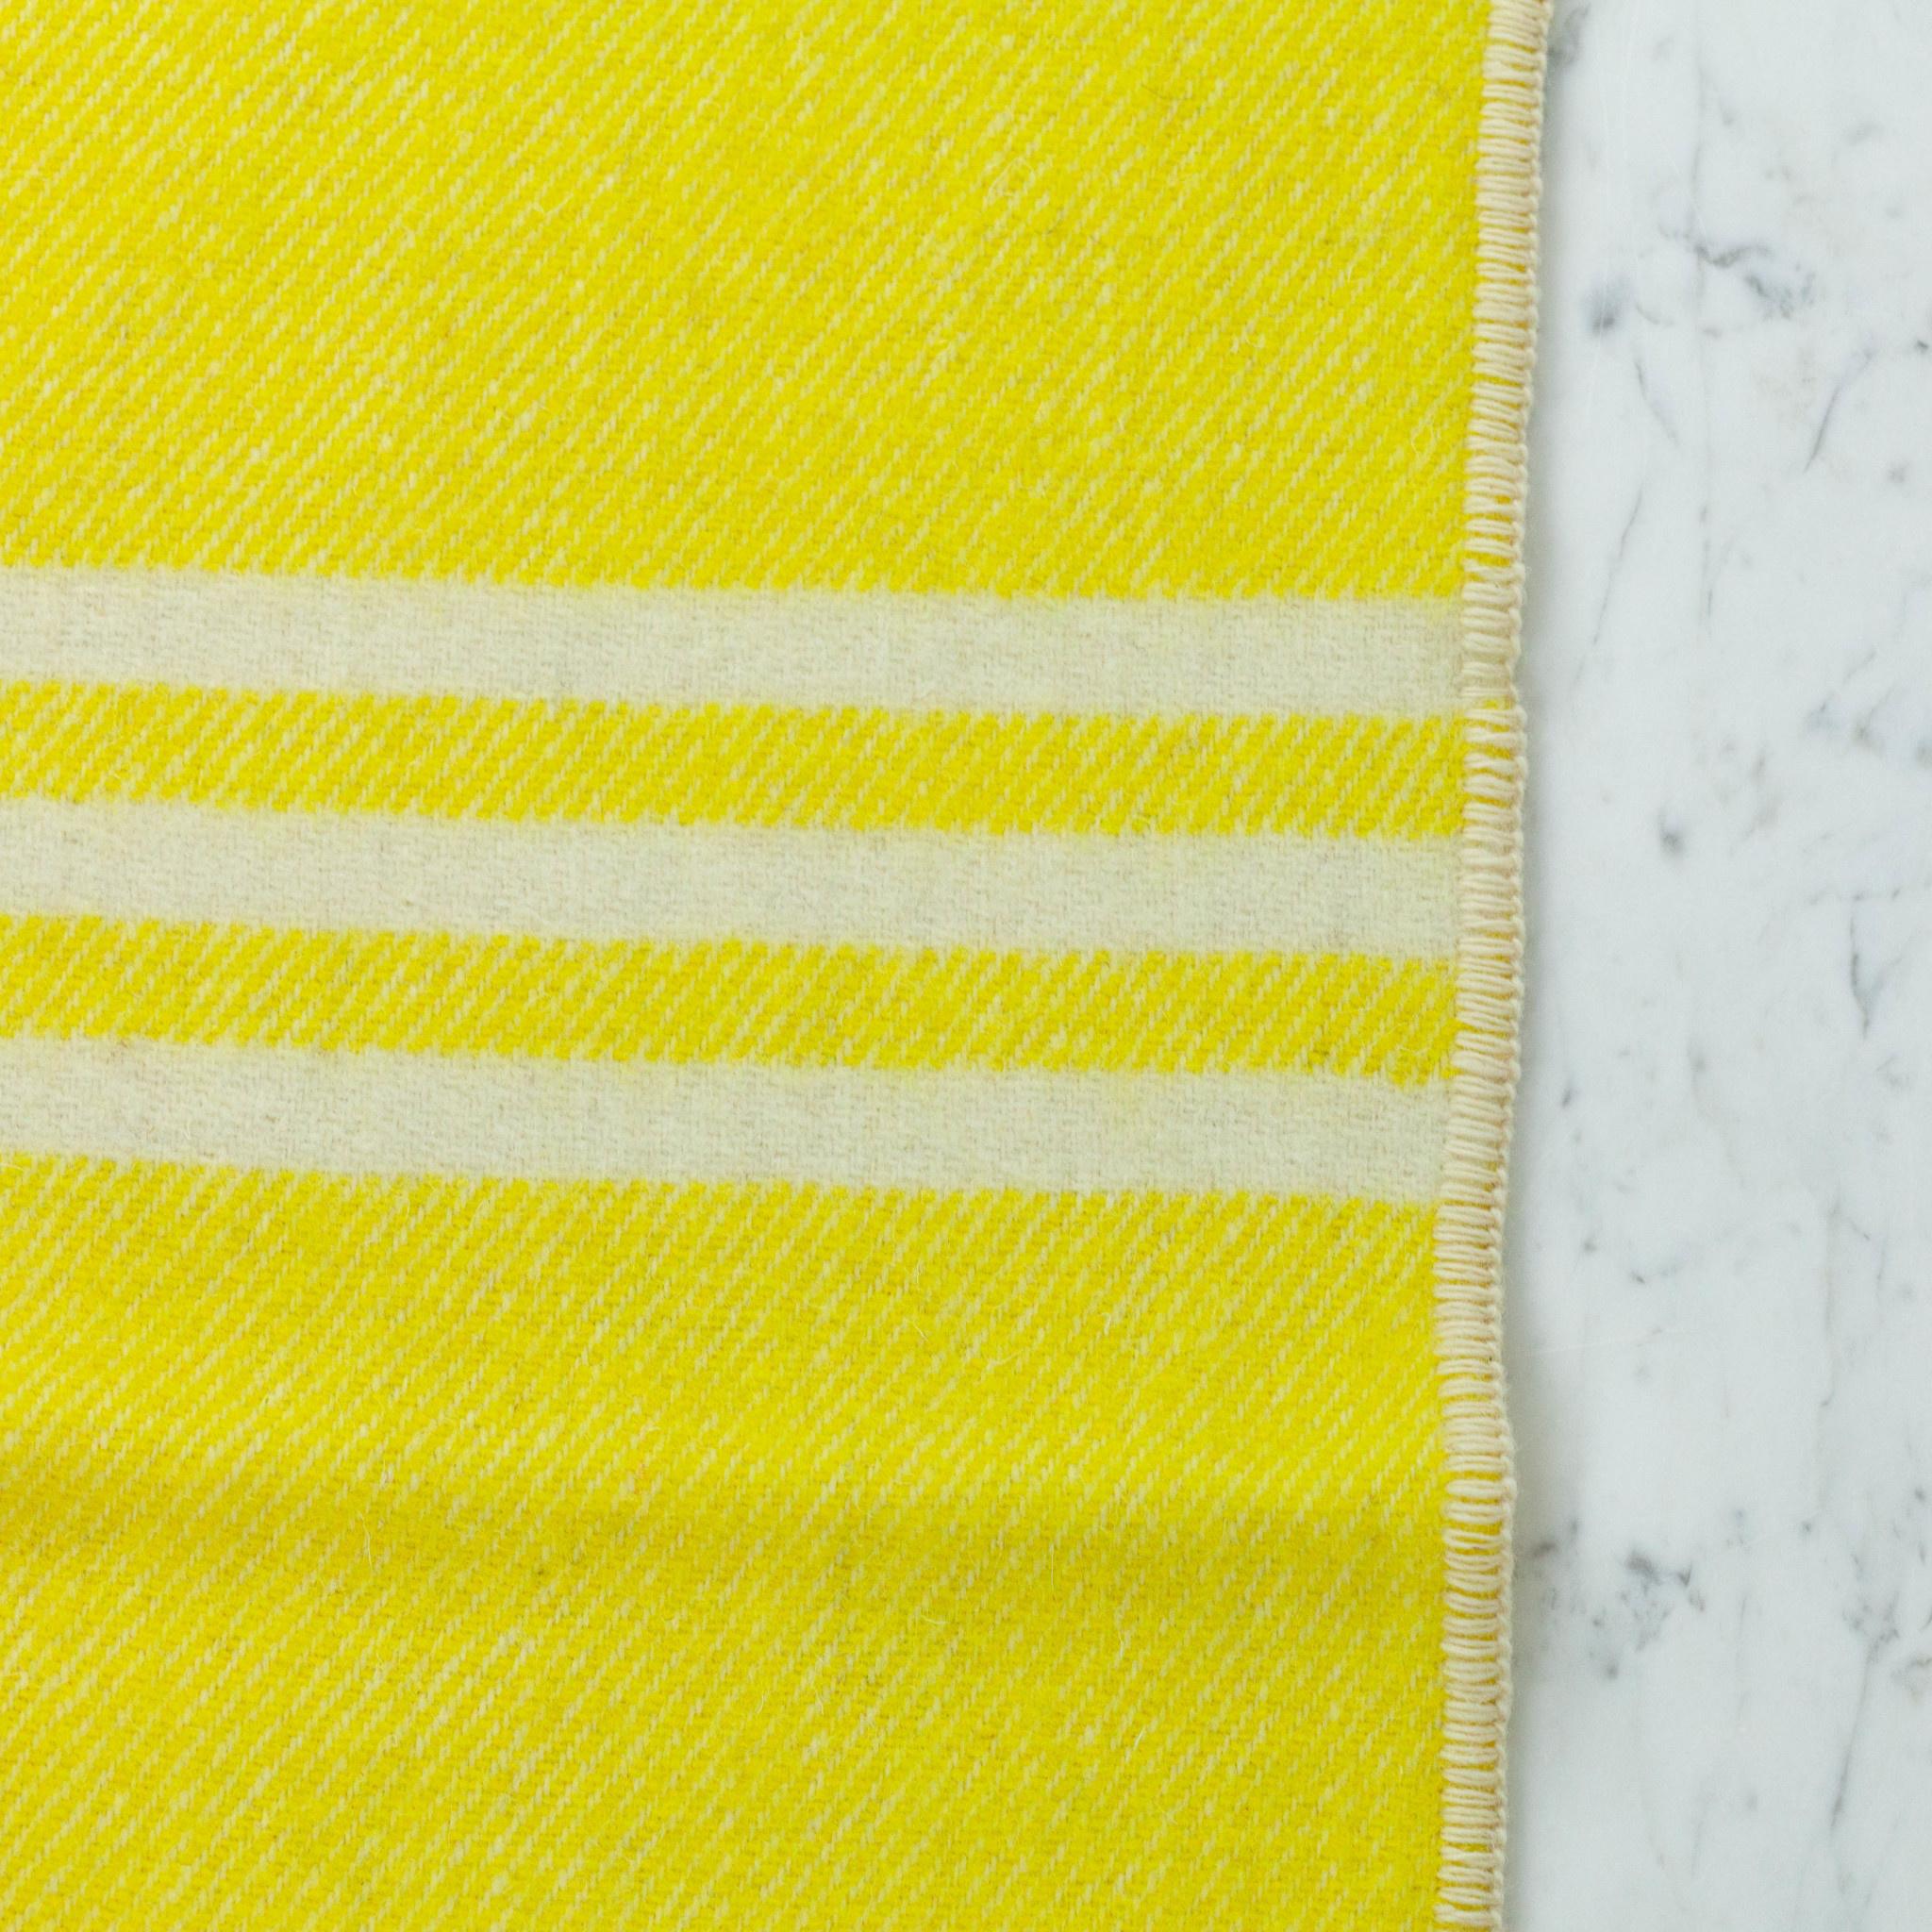 "MacAusland MacAusland Wool Lap Blanket - Yellow Tweed - 50 x 60"""